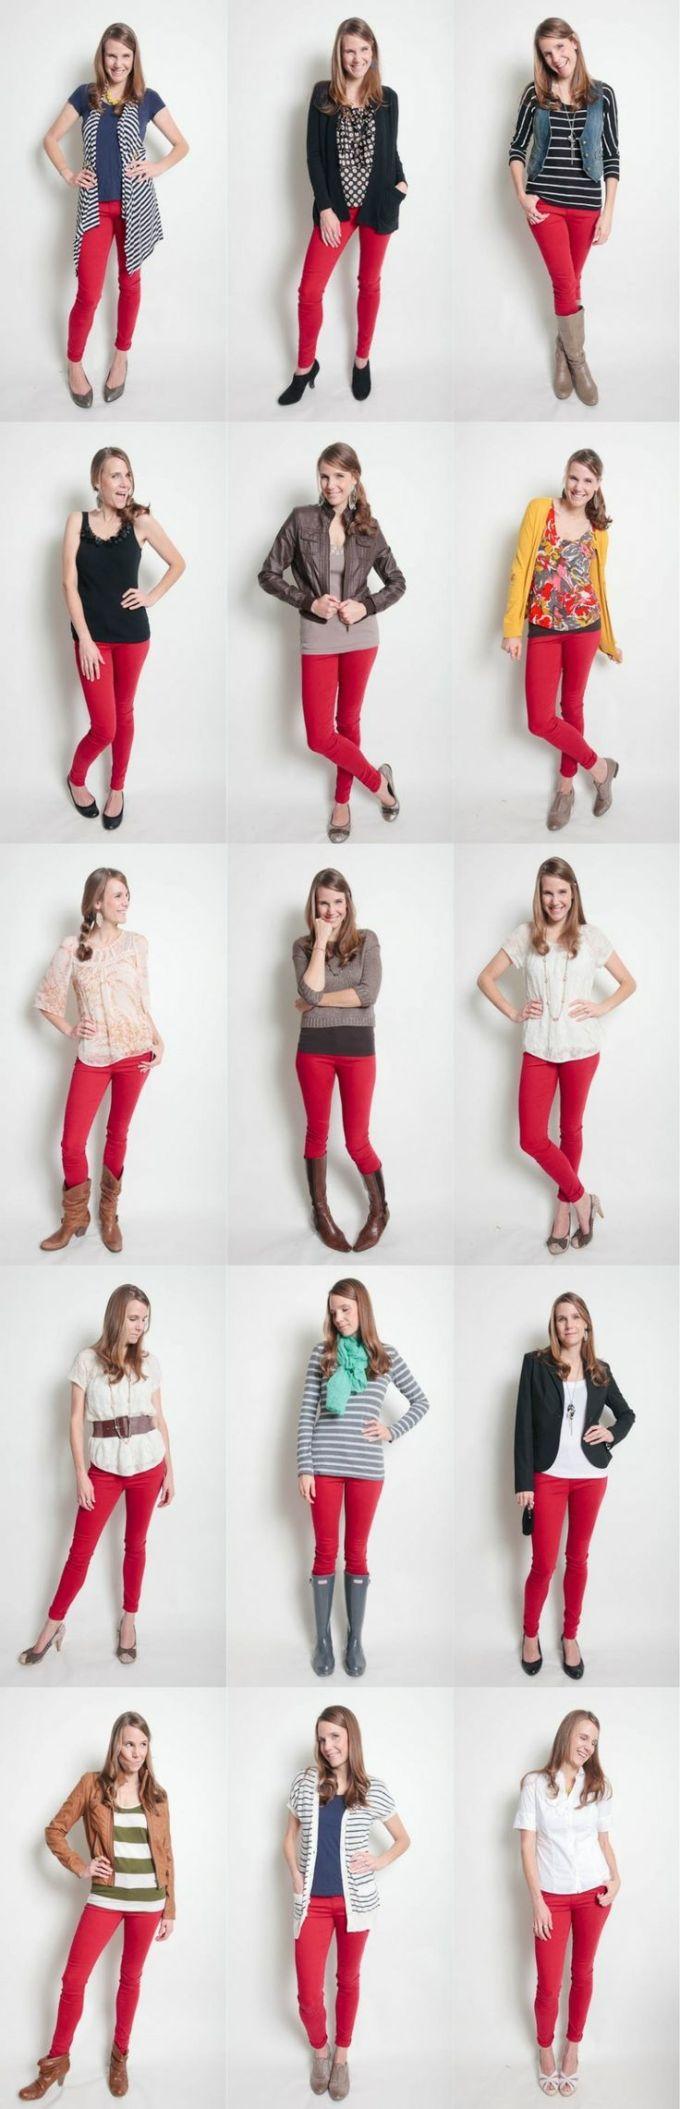 Pantalones Rojos - Shakider (63)